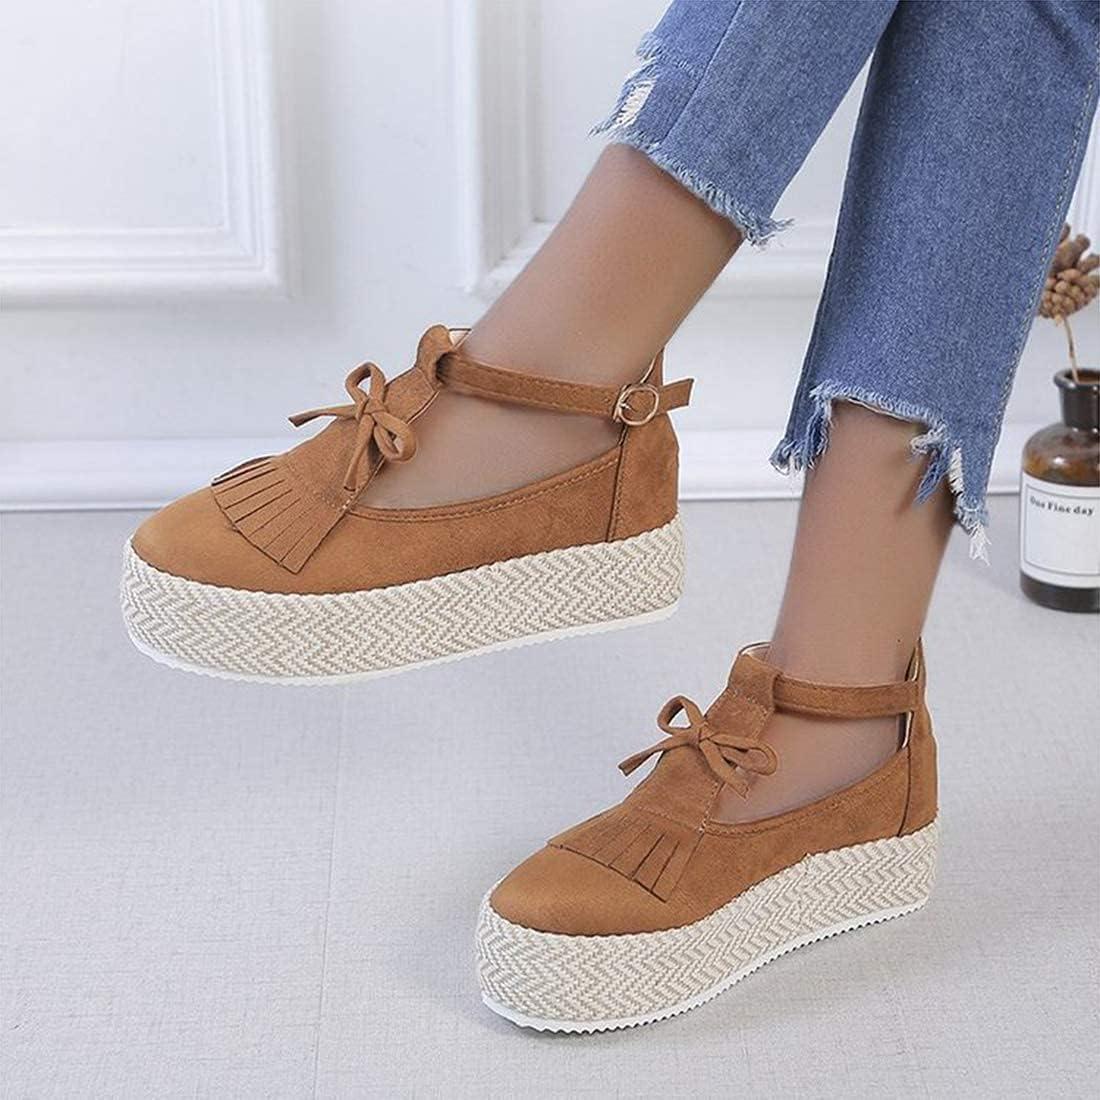 FMOGE Sandals for Women Platform Closed Overseas parallel import regular item Tassel Sandal Max 75% OFF Leather To